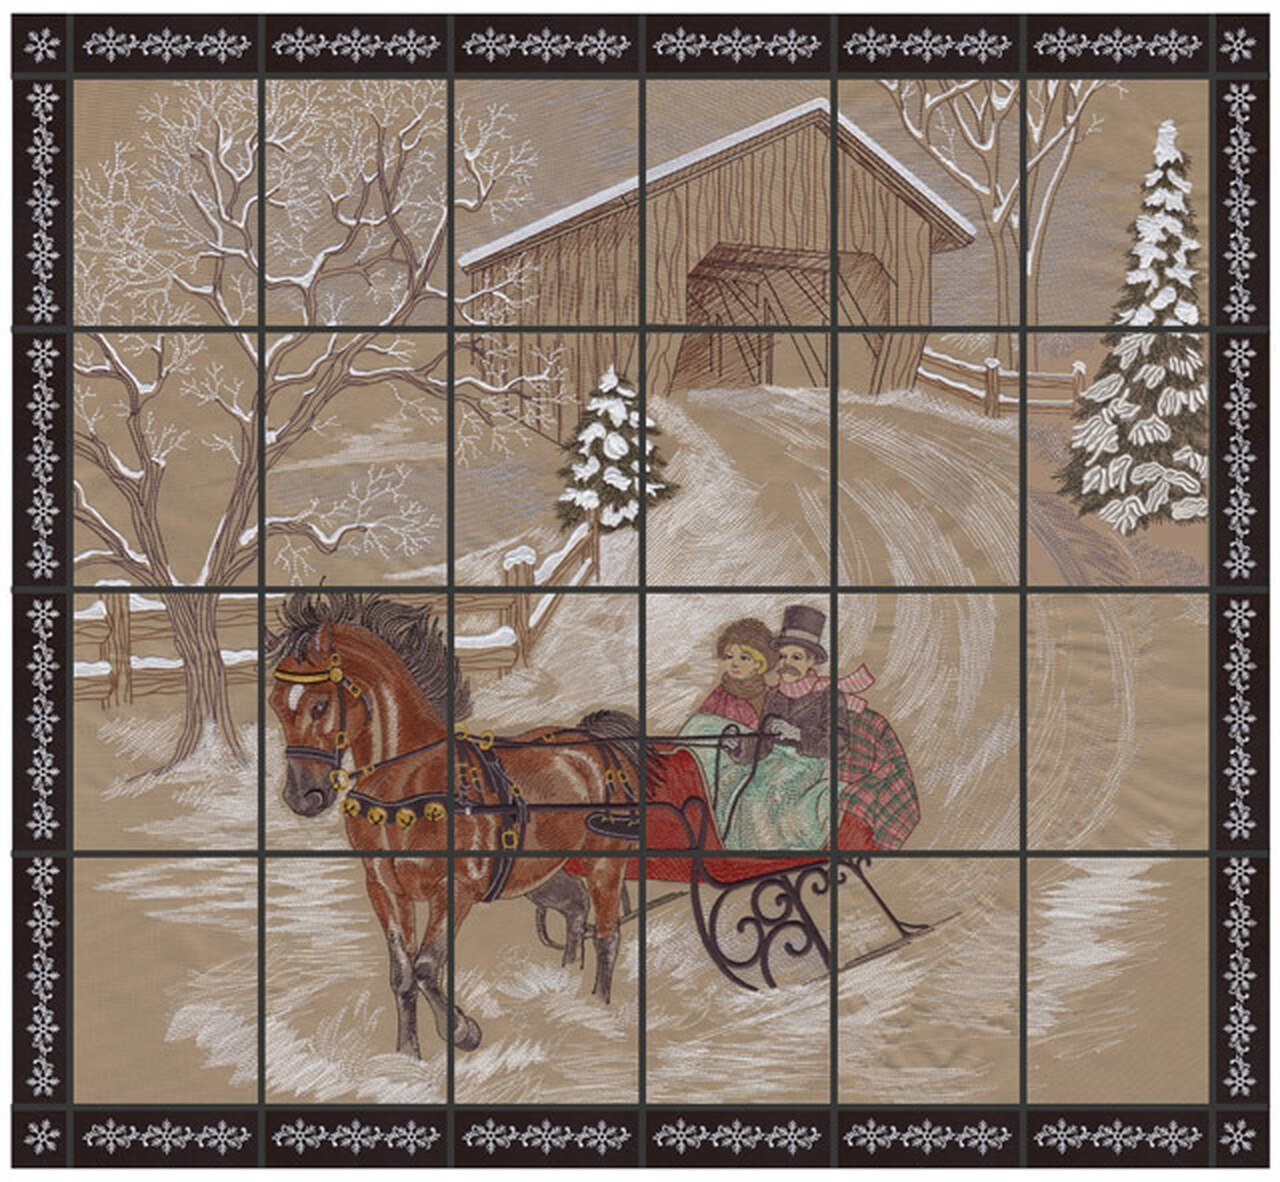 Dashing Through the Snow - OESD Machine Embroidery